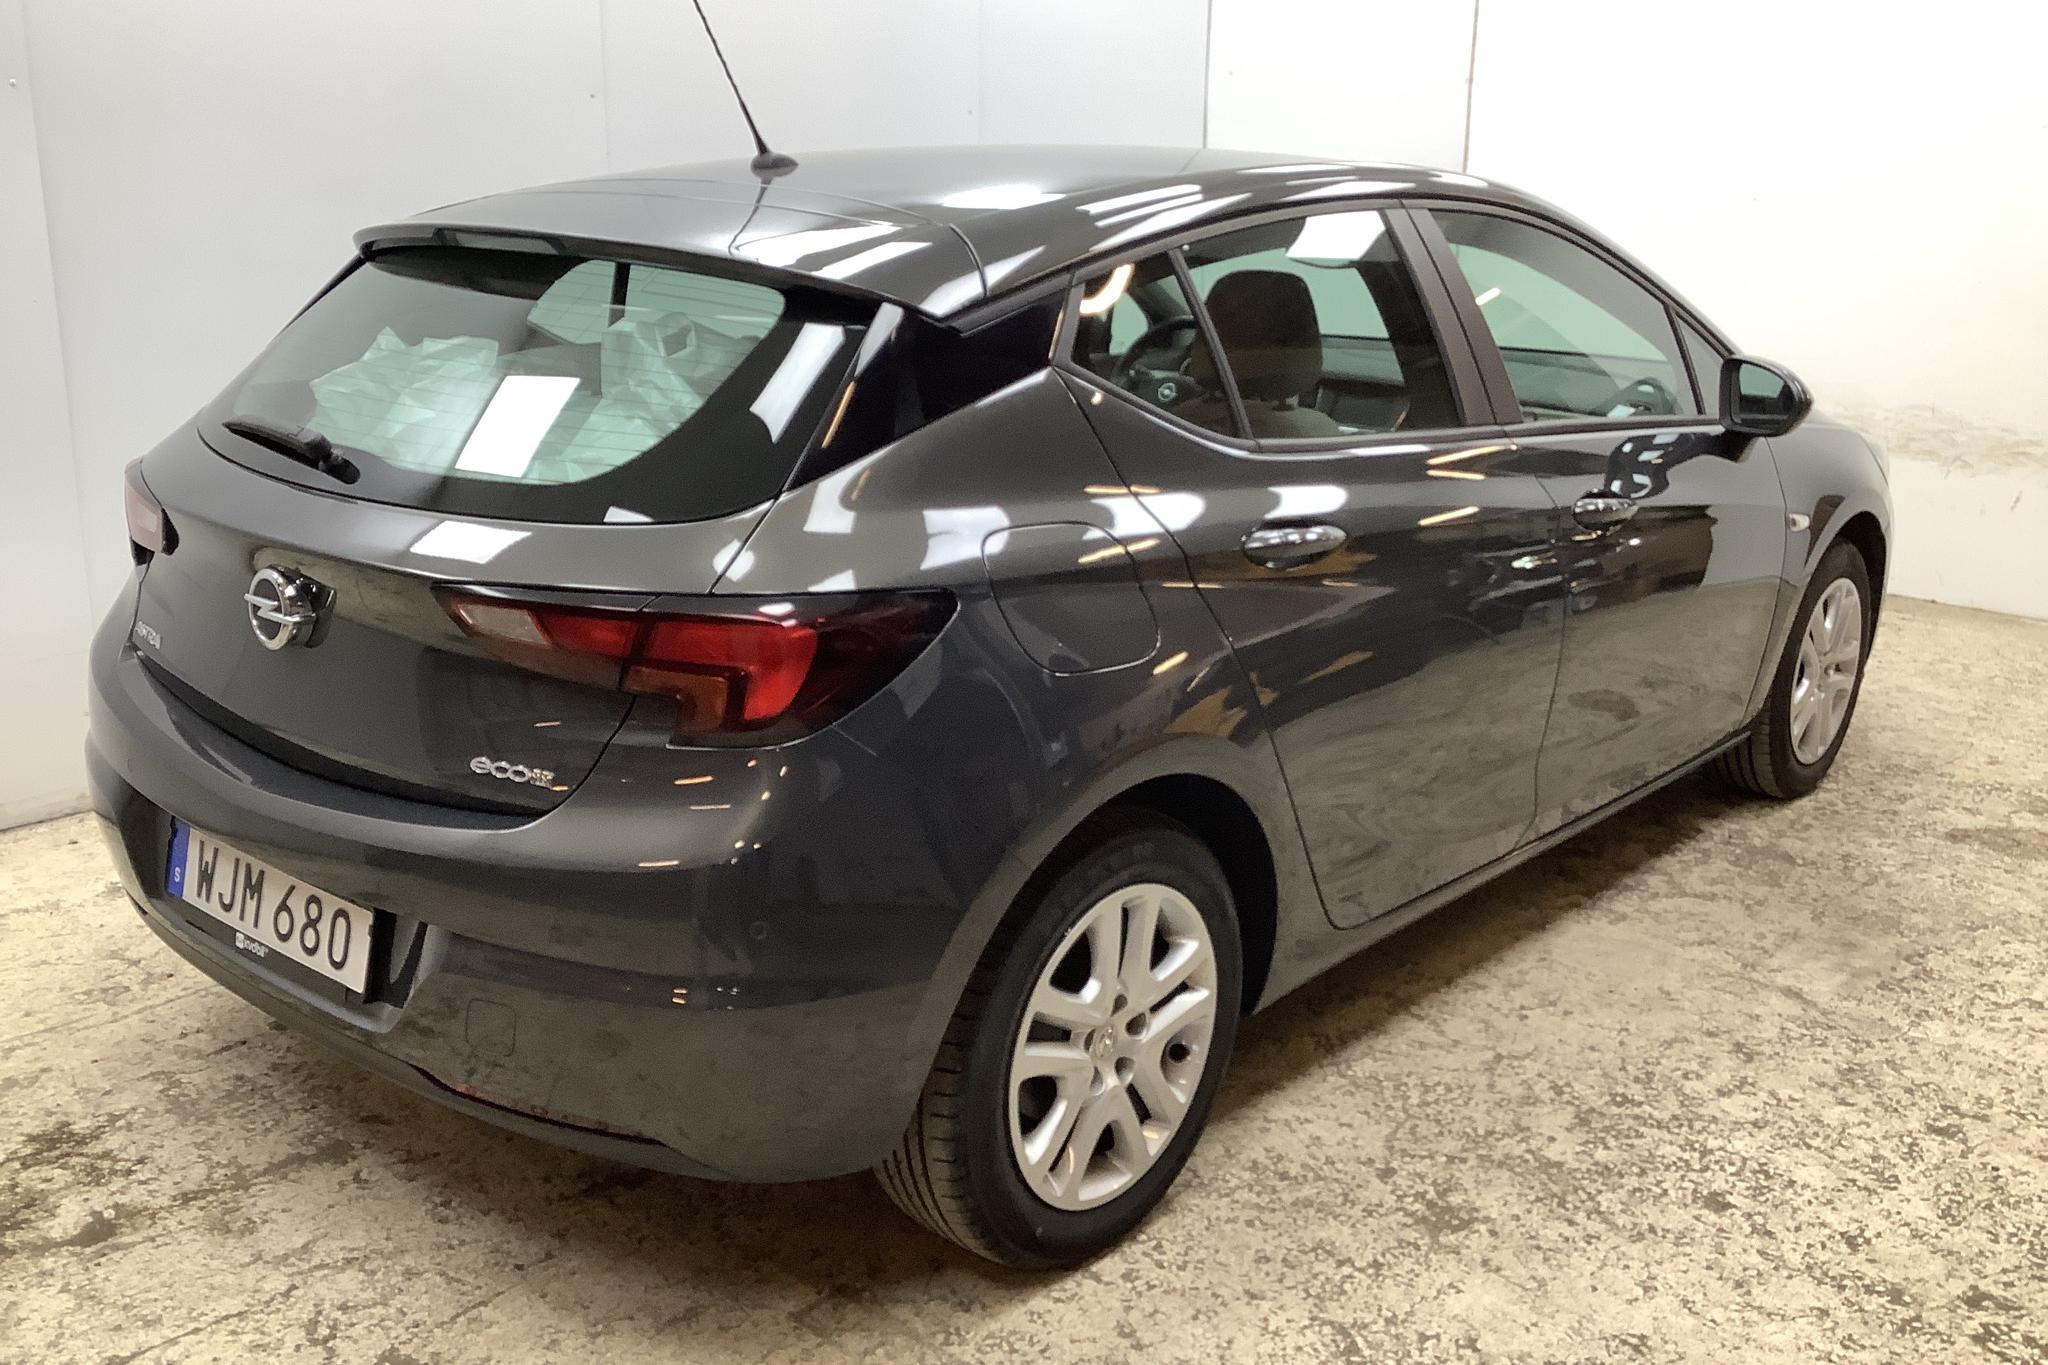 Opel Astra 1.0 Turbo ECOTEC 5dr (105hk) - 4 307 mil - Manuell - grå - 2016